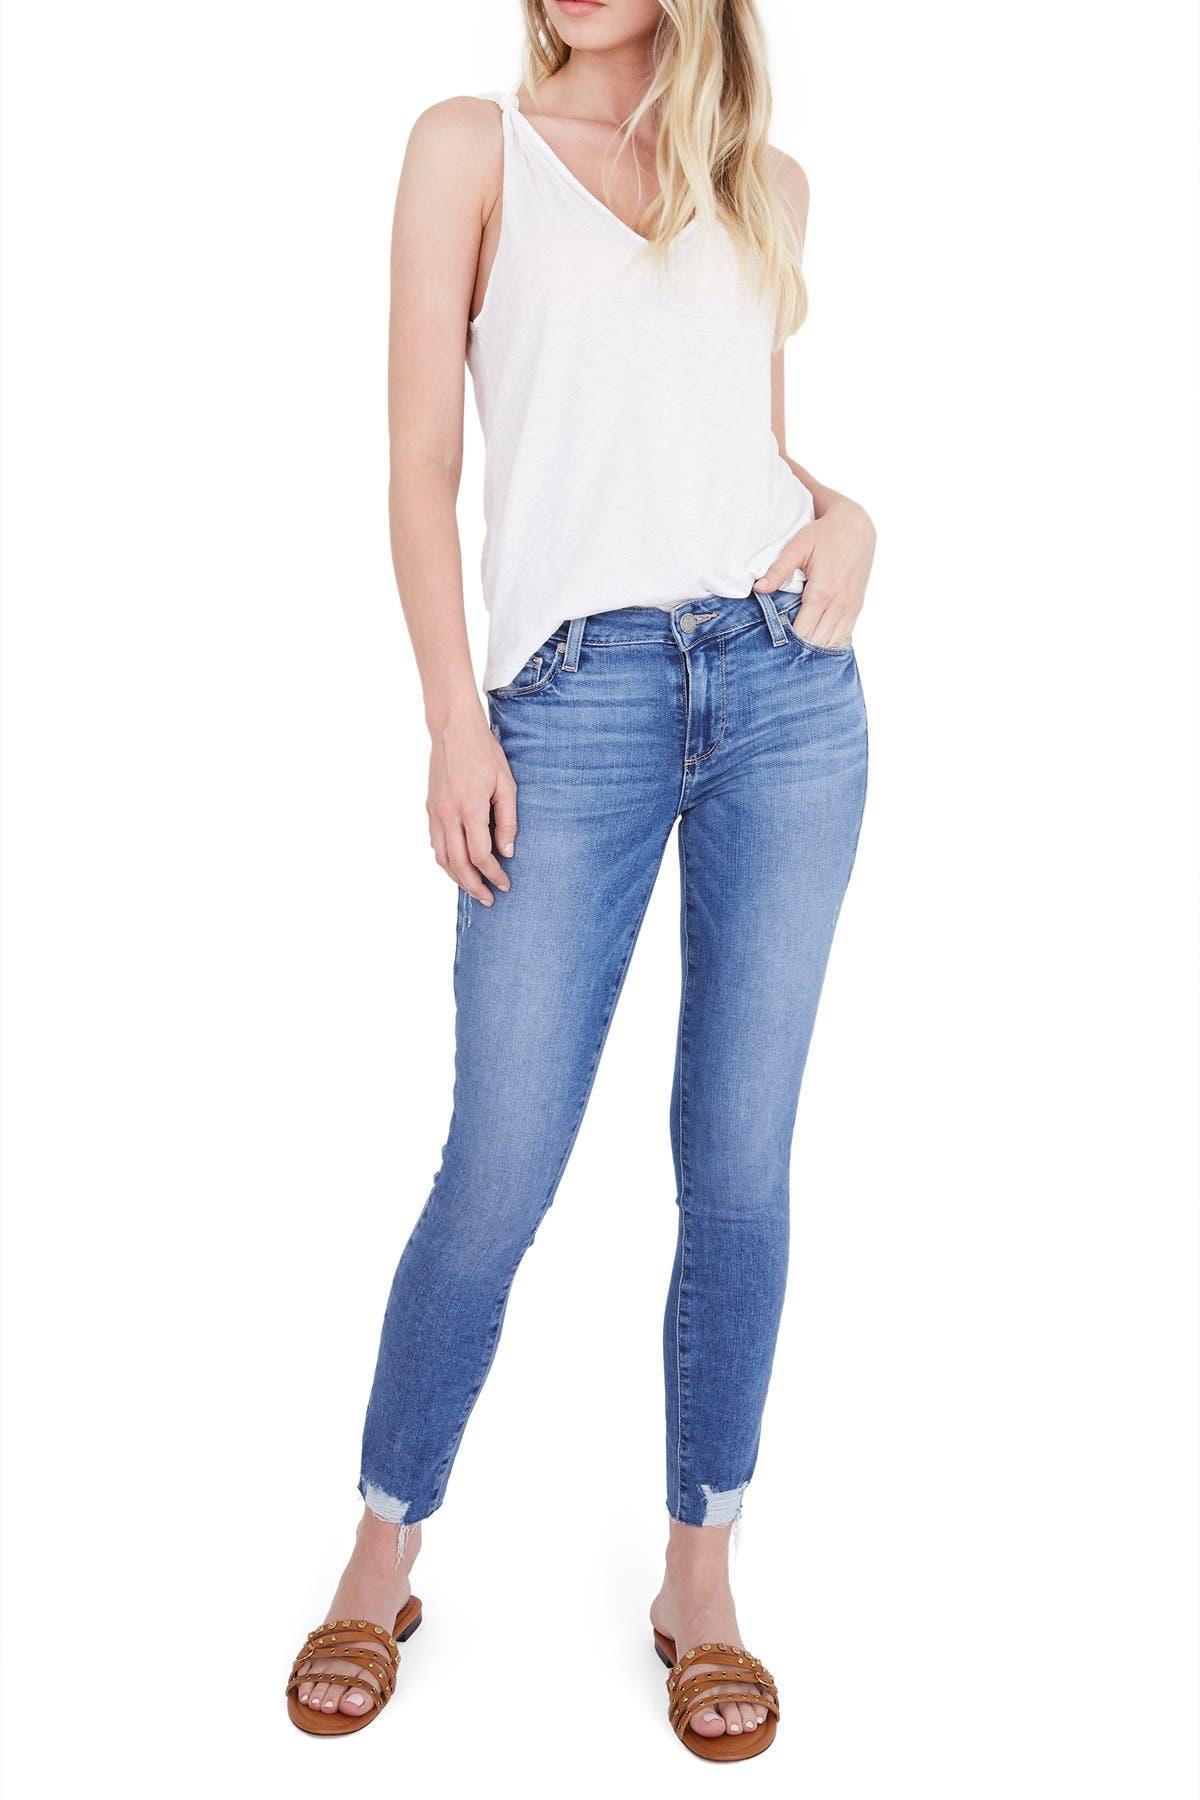 PAIGE Womens Verdugo Ankle Jean